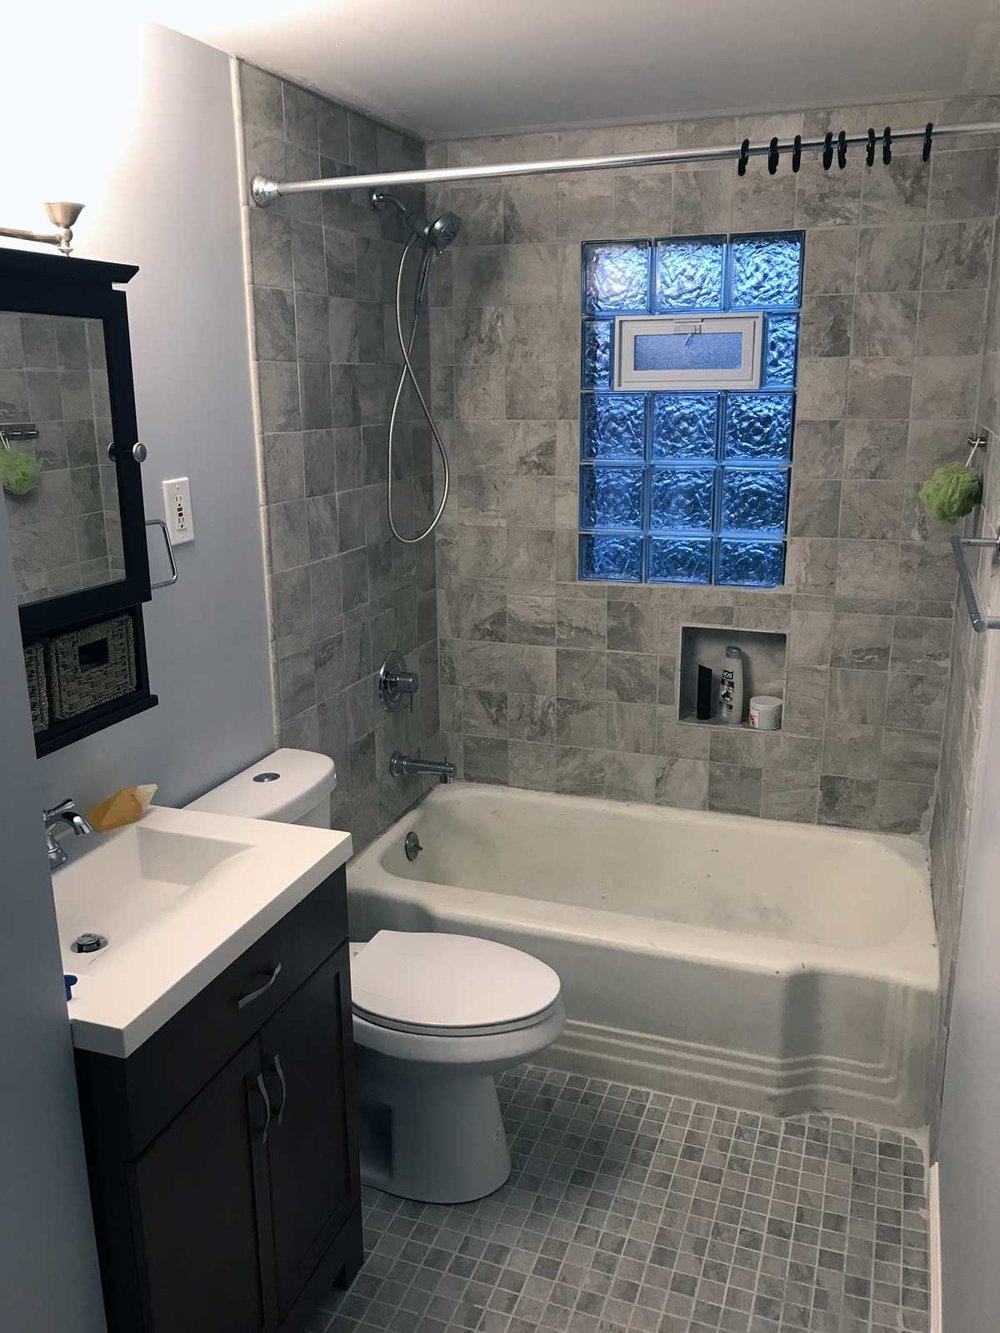 15 Day Bathroom Renovation Project